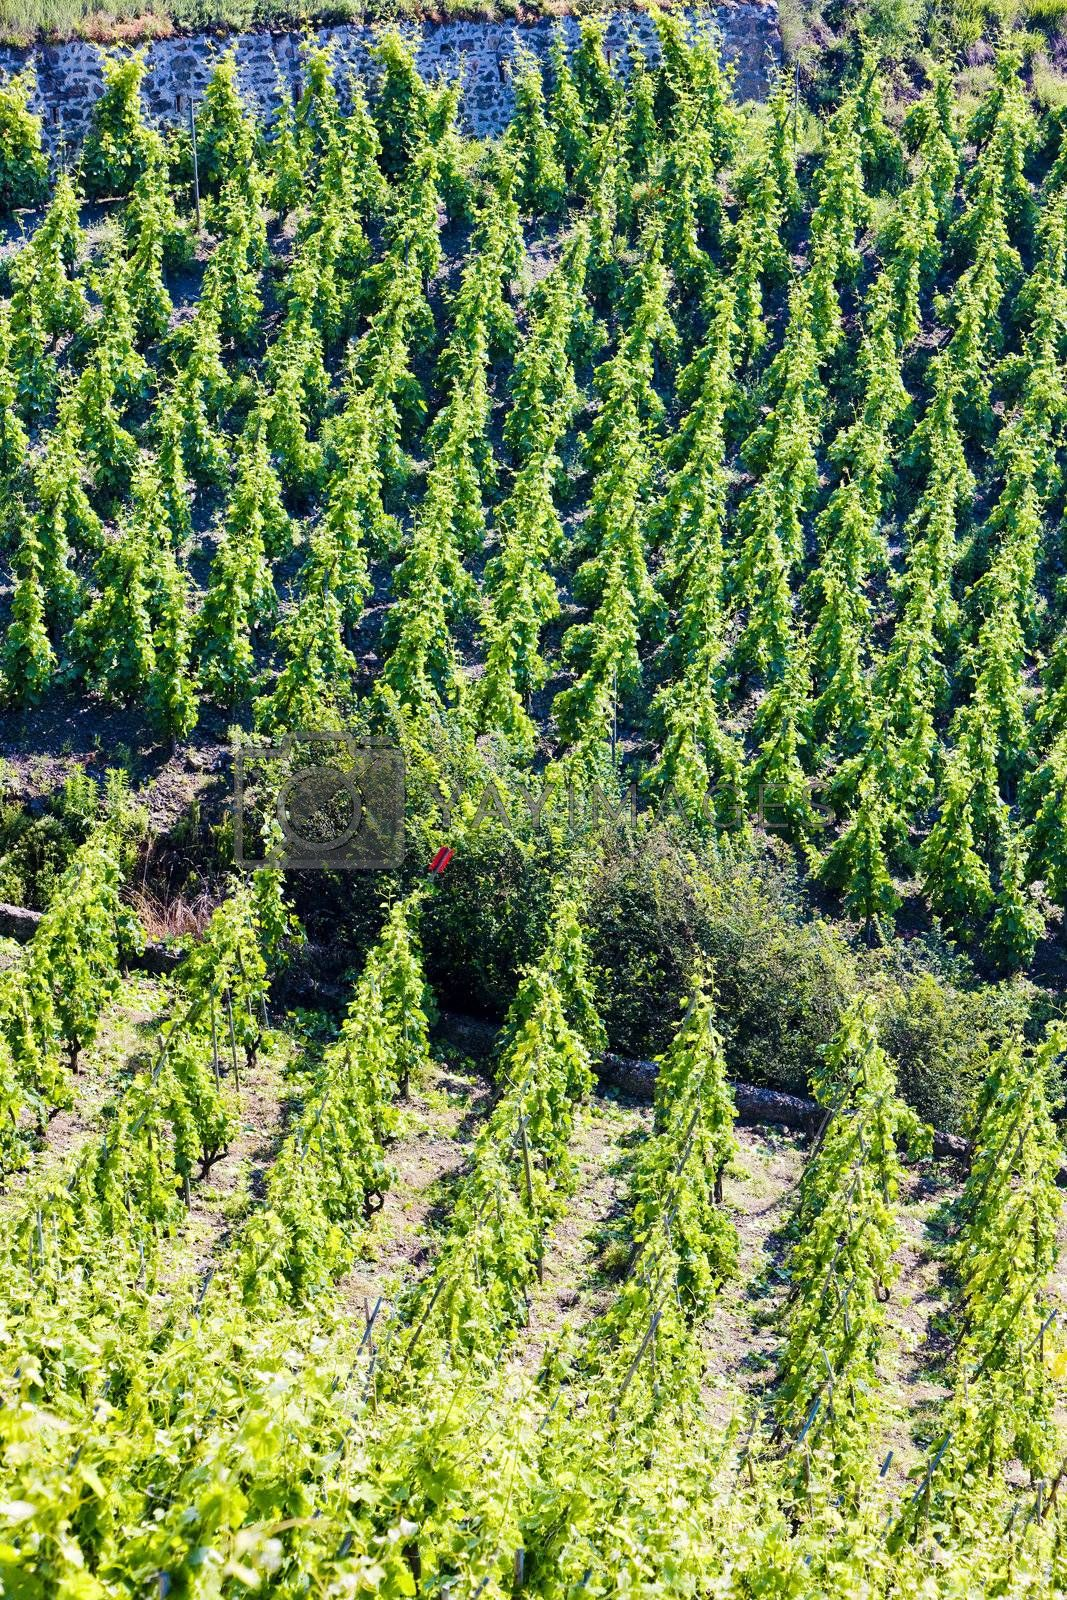 grand cru vineyard, Cote Rotie, Rhone-Alpes, France